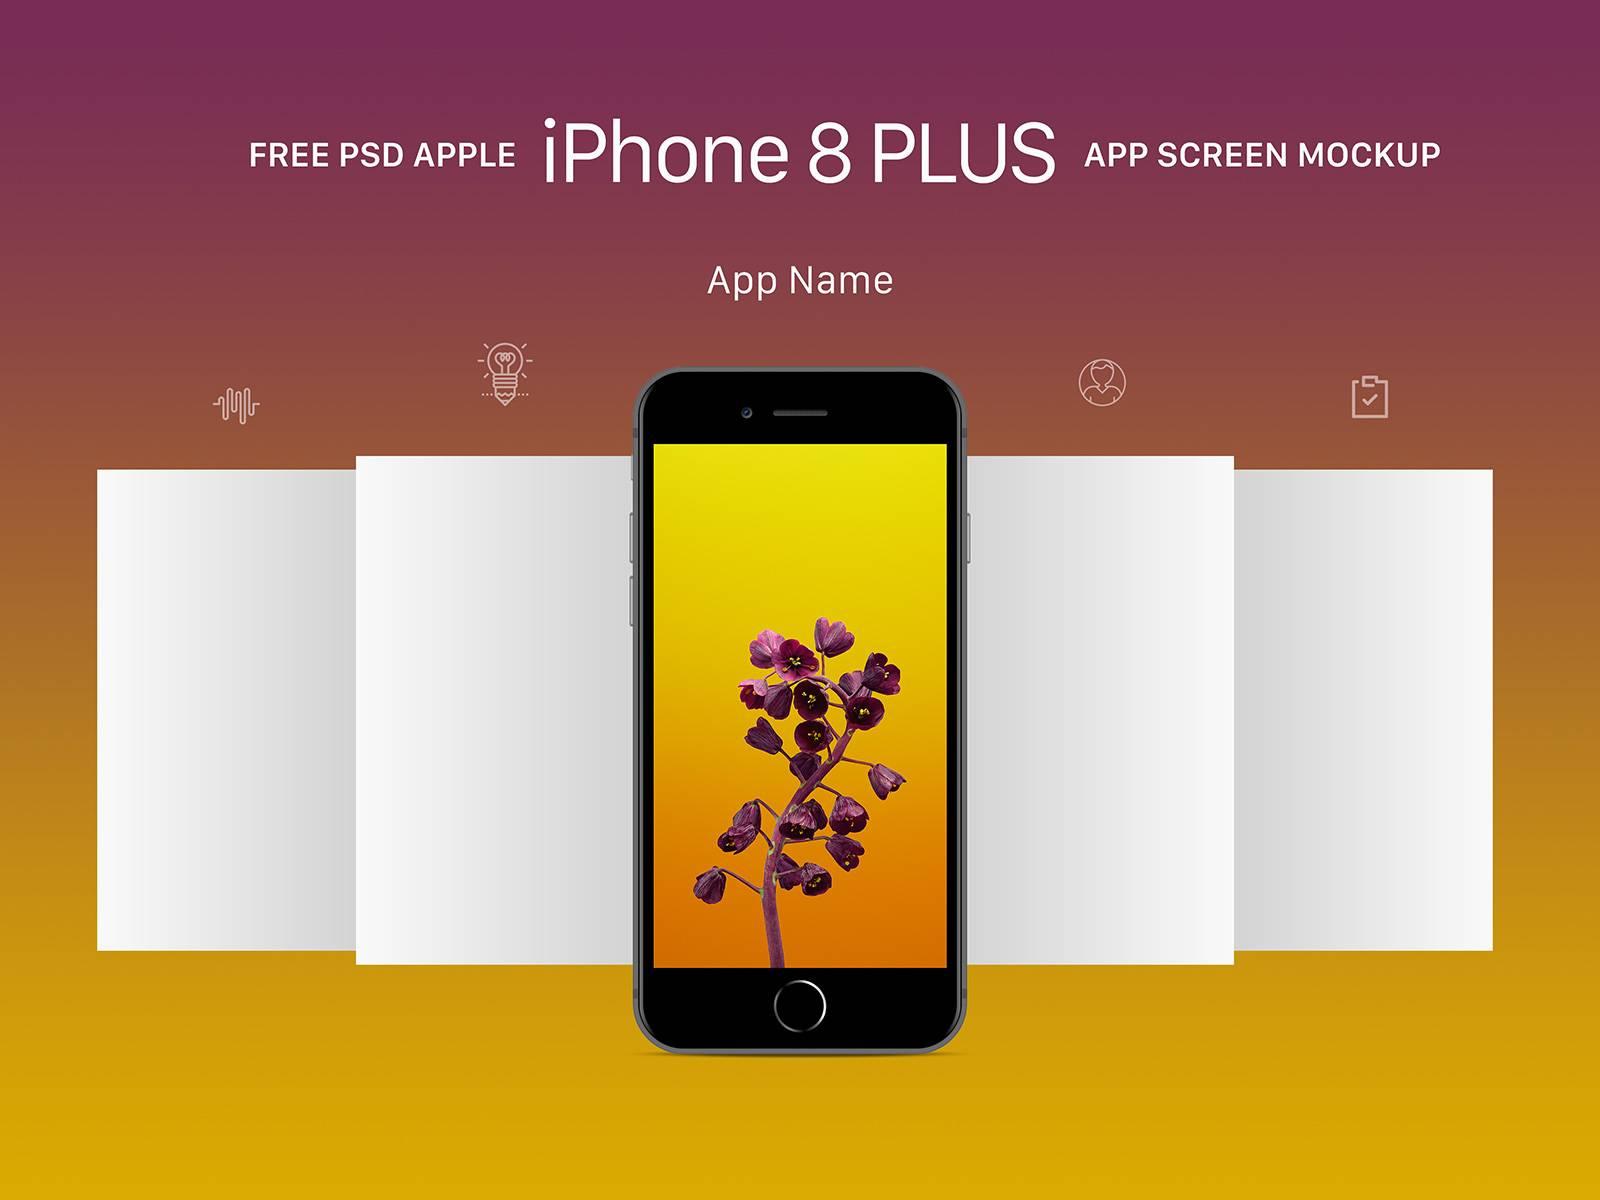 Iphone 8 App Mockup Psd